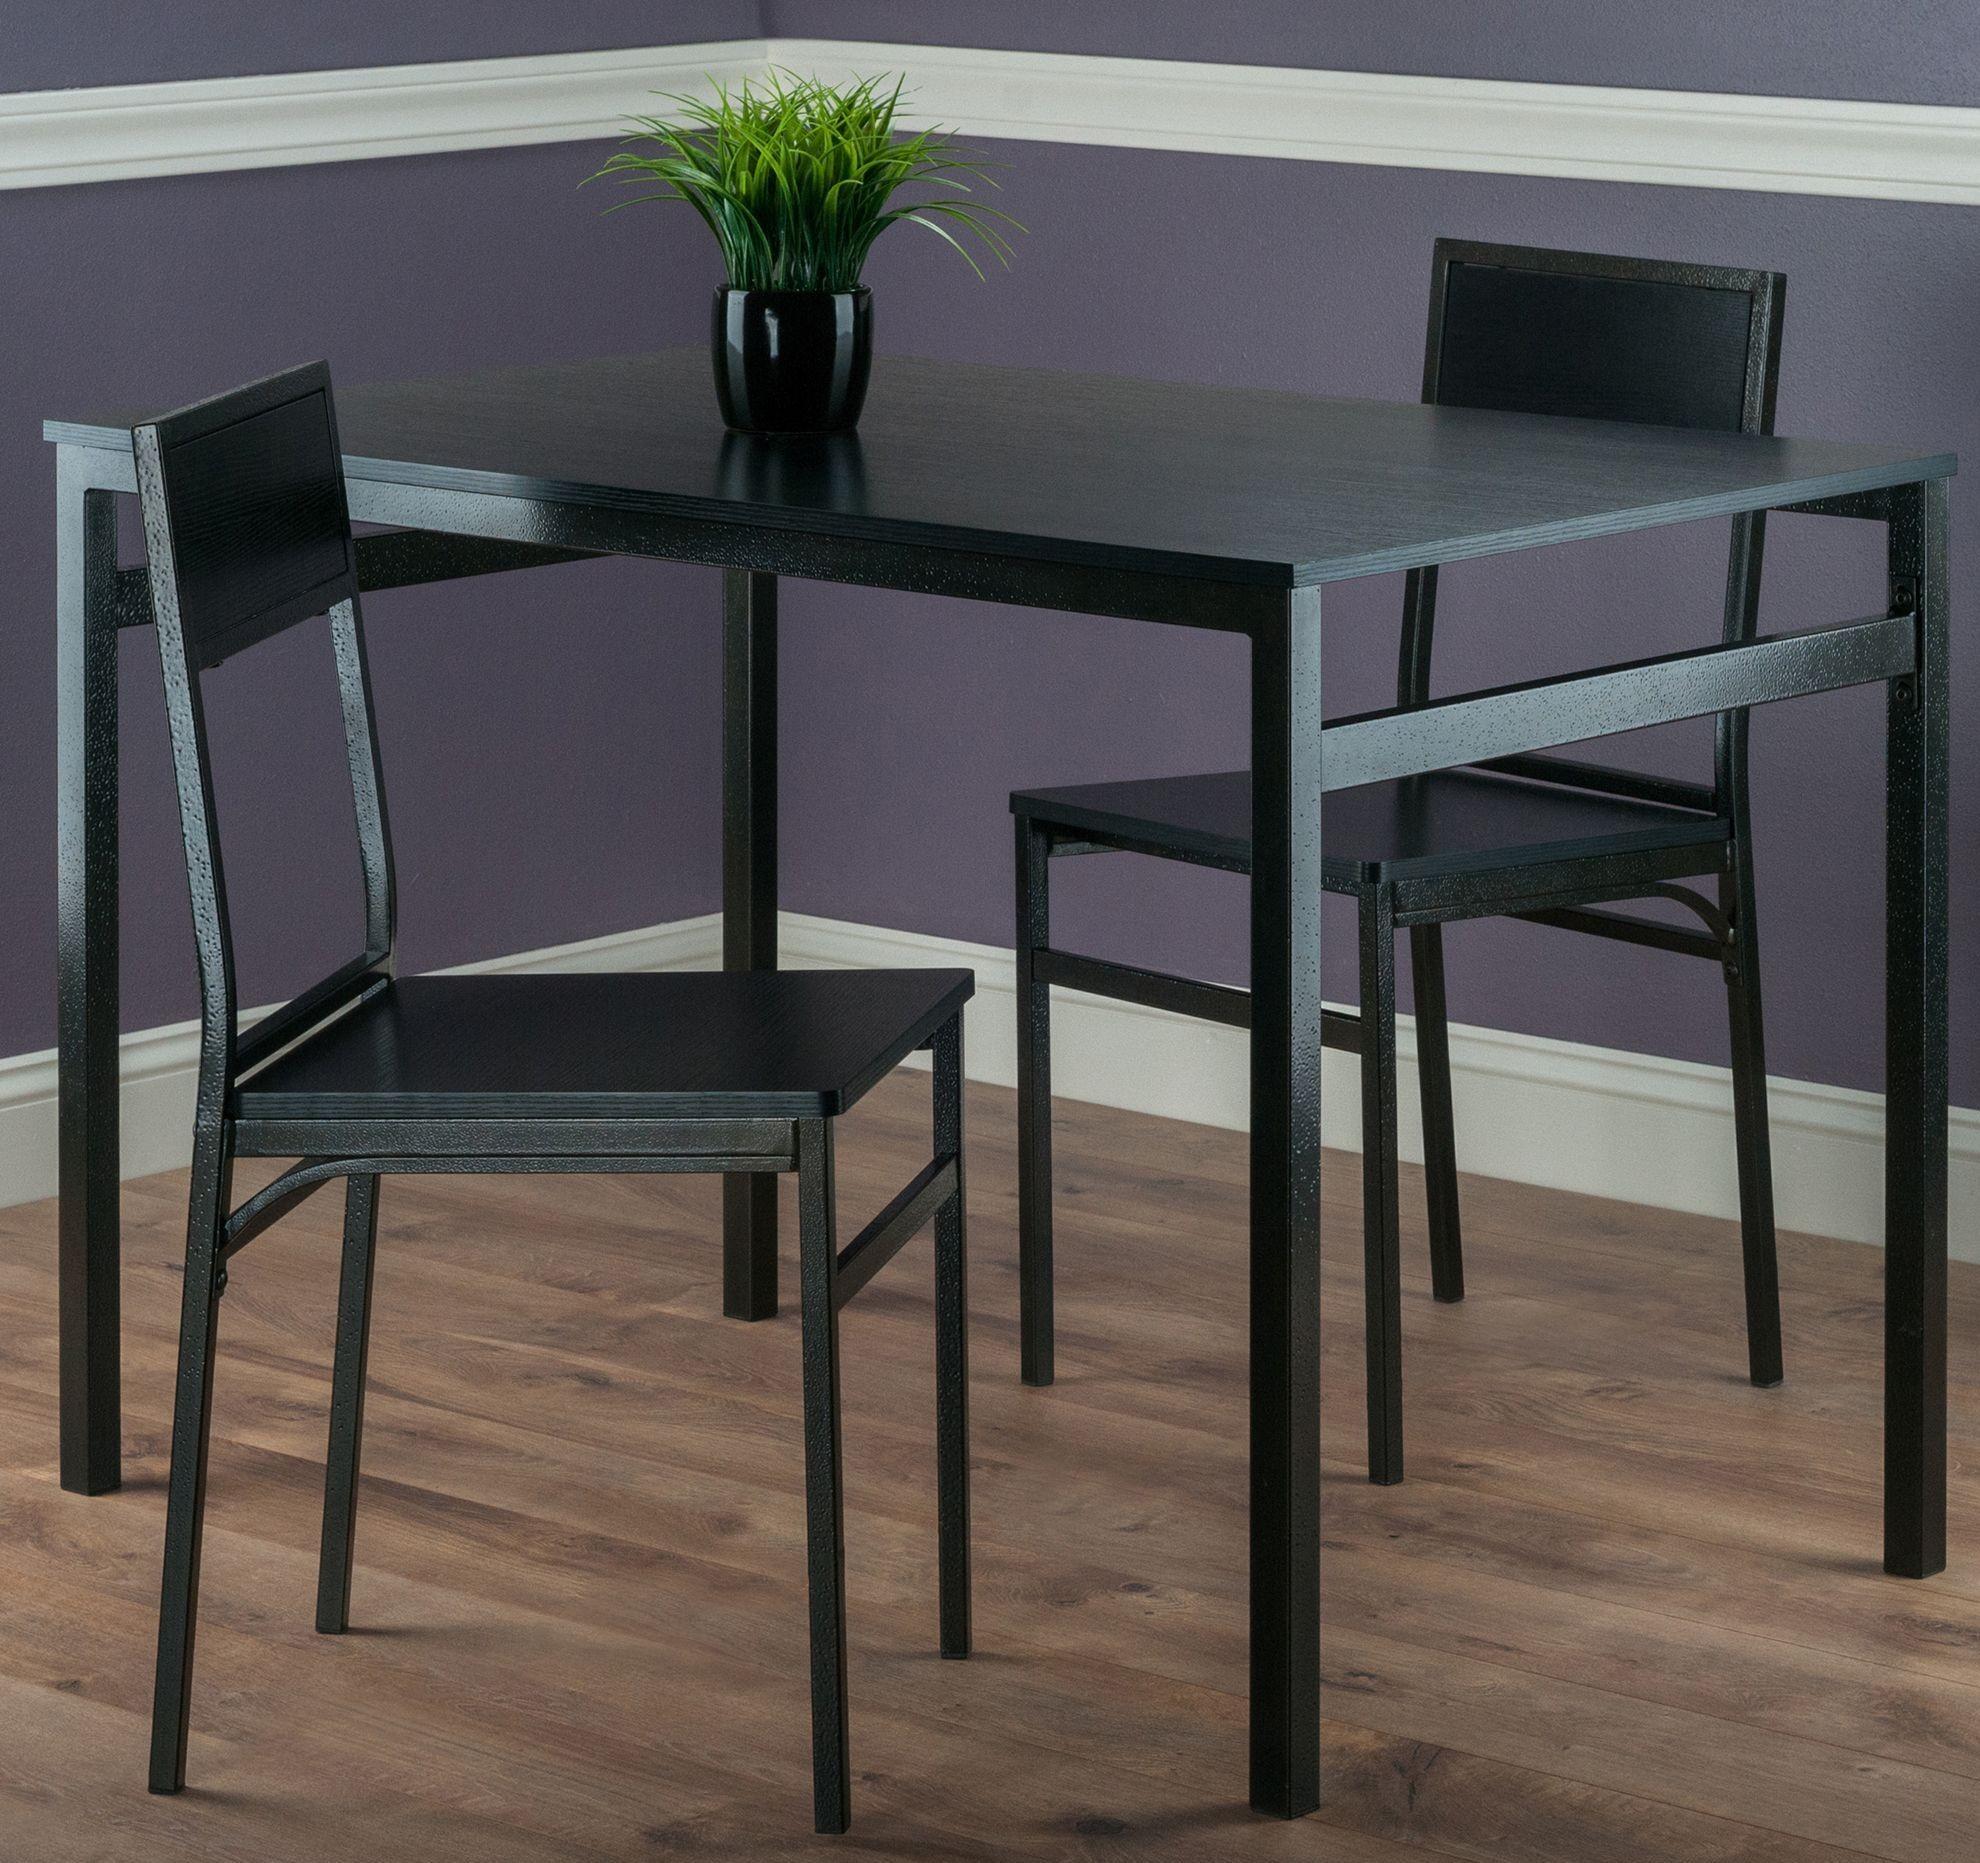 3 Piece Dining Room Set: Milton Black 3 Piece Dining Room Set From WinsomeWood